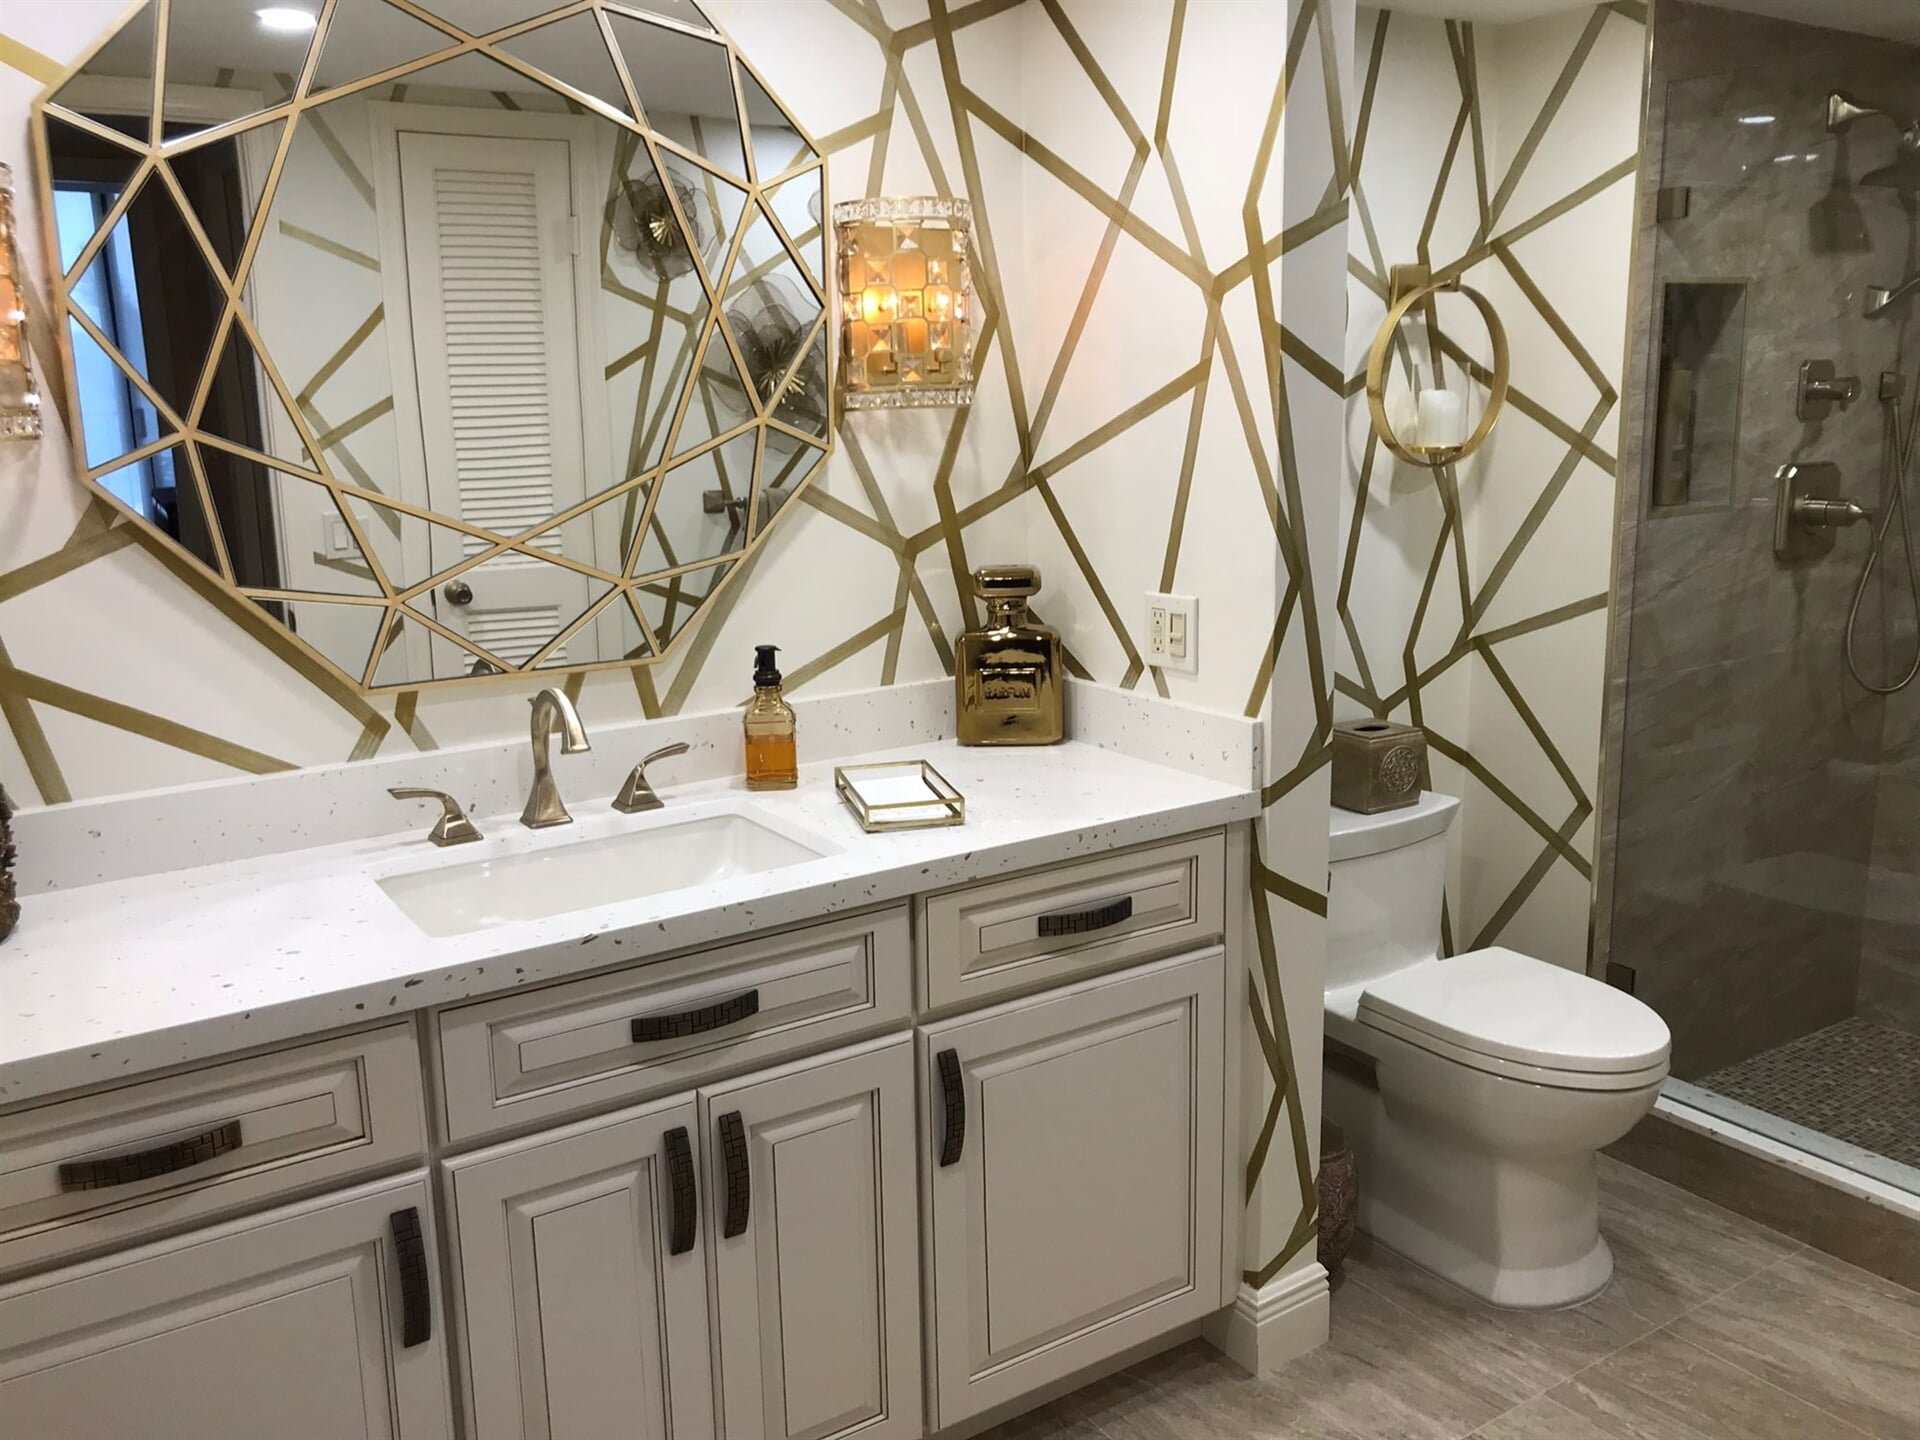 Art deco bathroom remodel in Jupiter, FL from Floors For You Kitchen & Bath